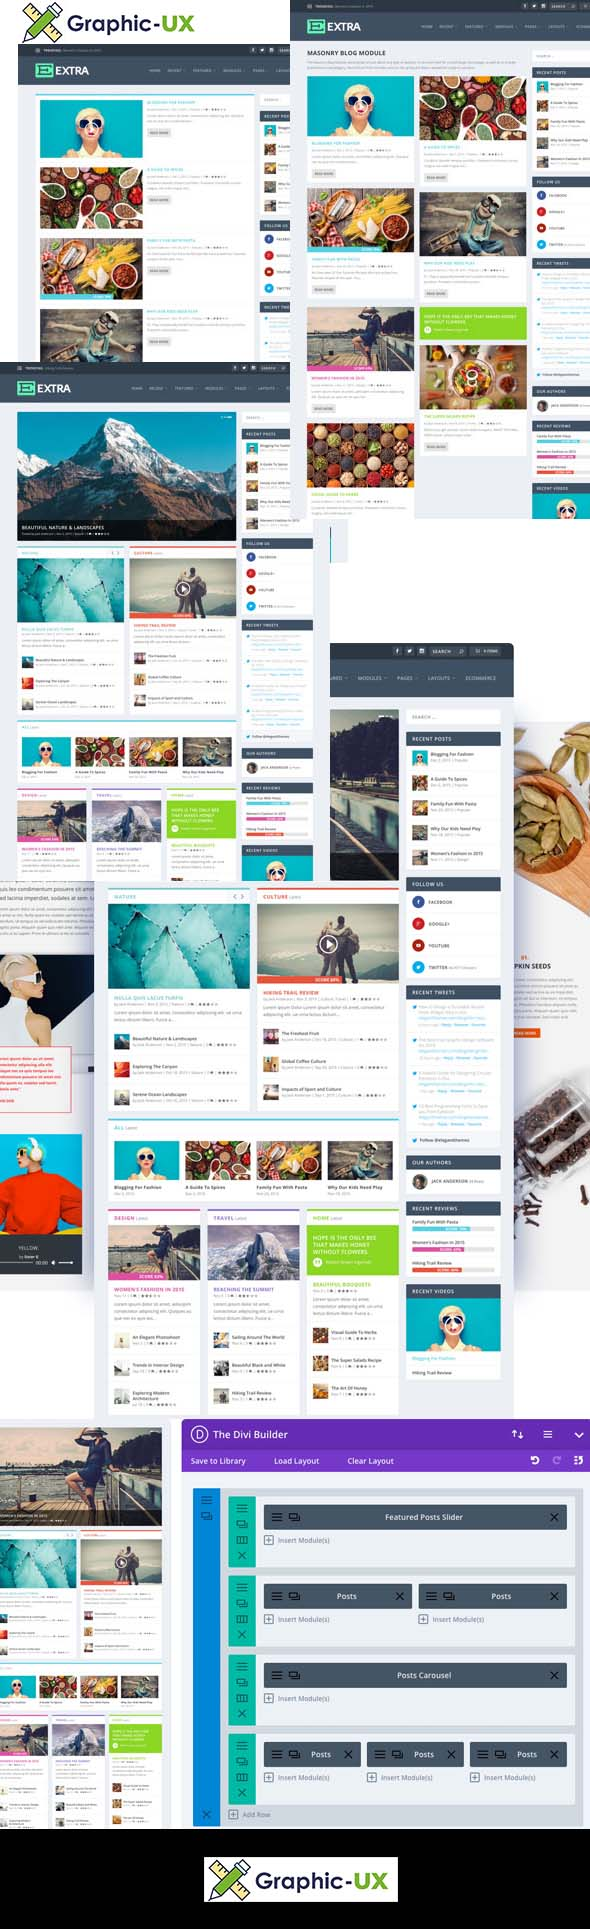 Extra v4.0.5 – Elegantthemes Premium WordPress Theme